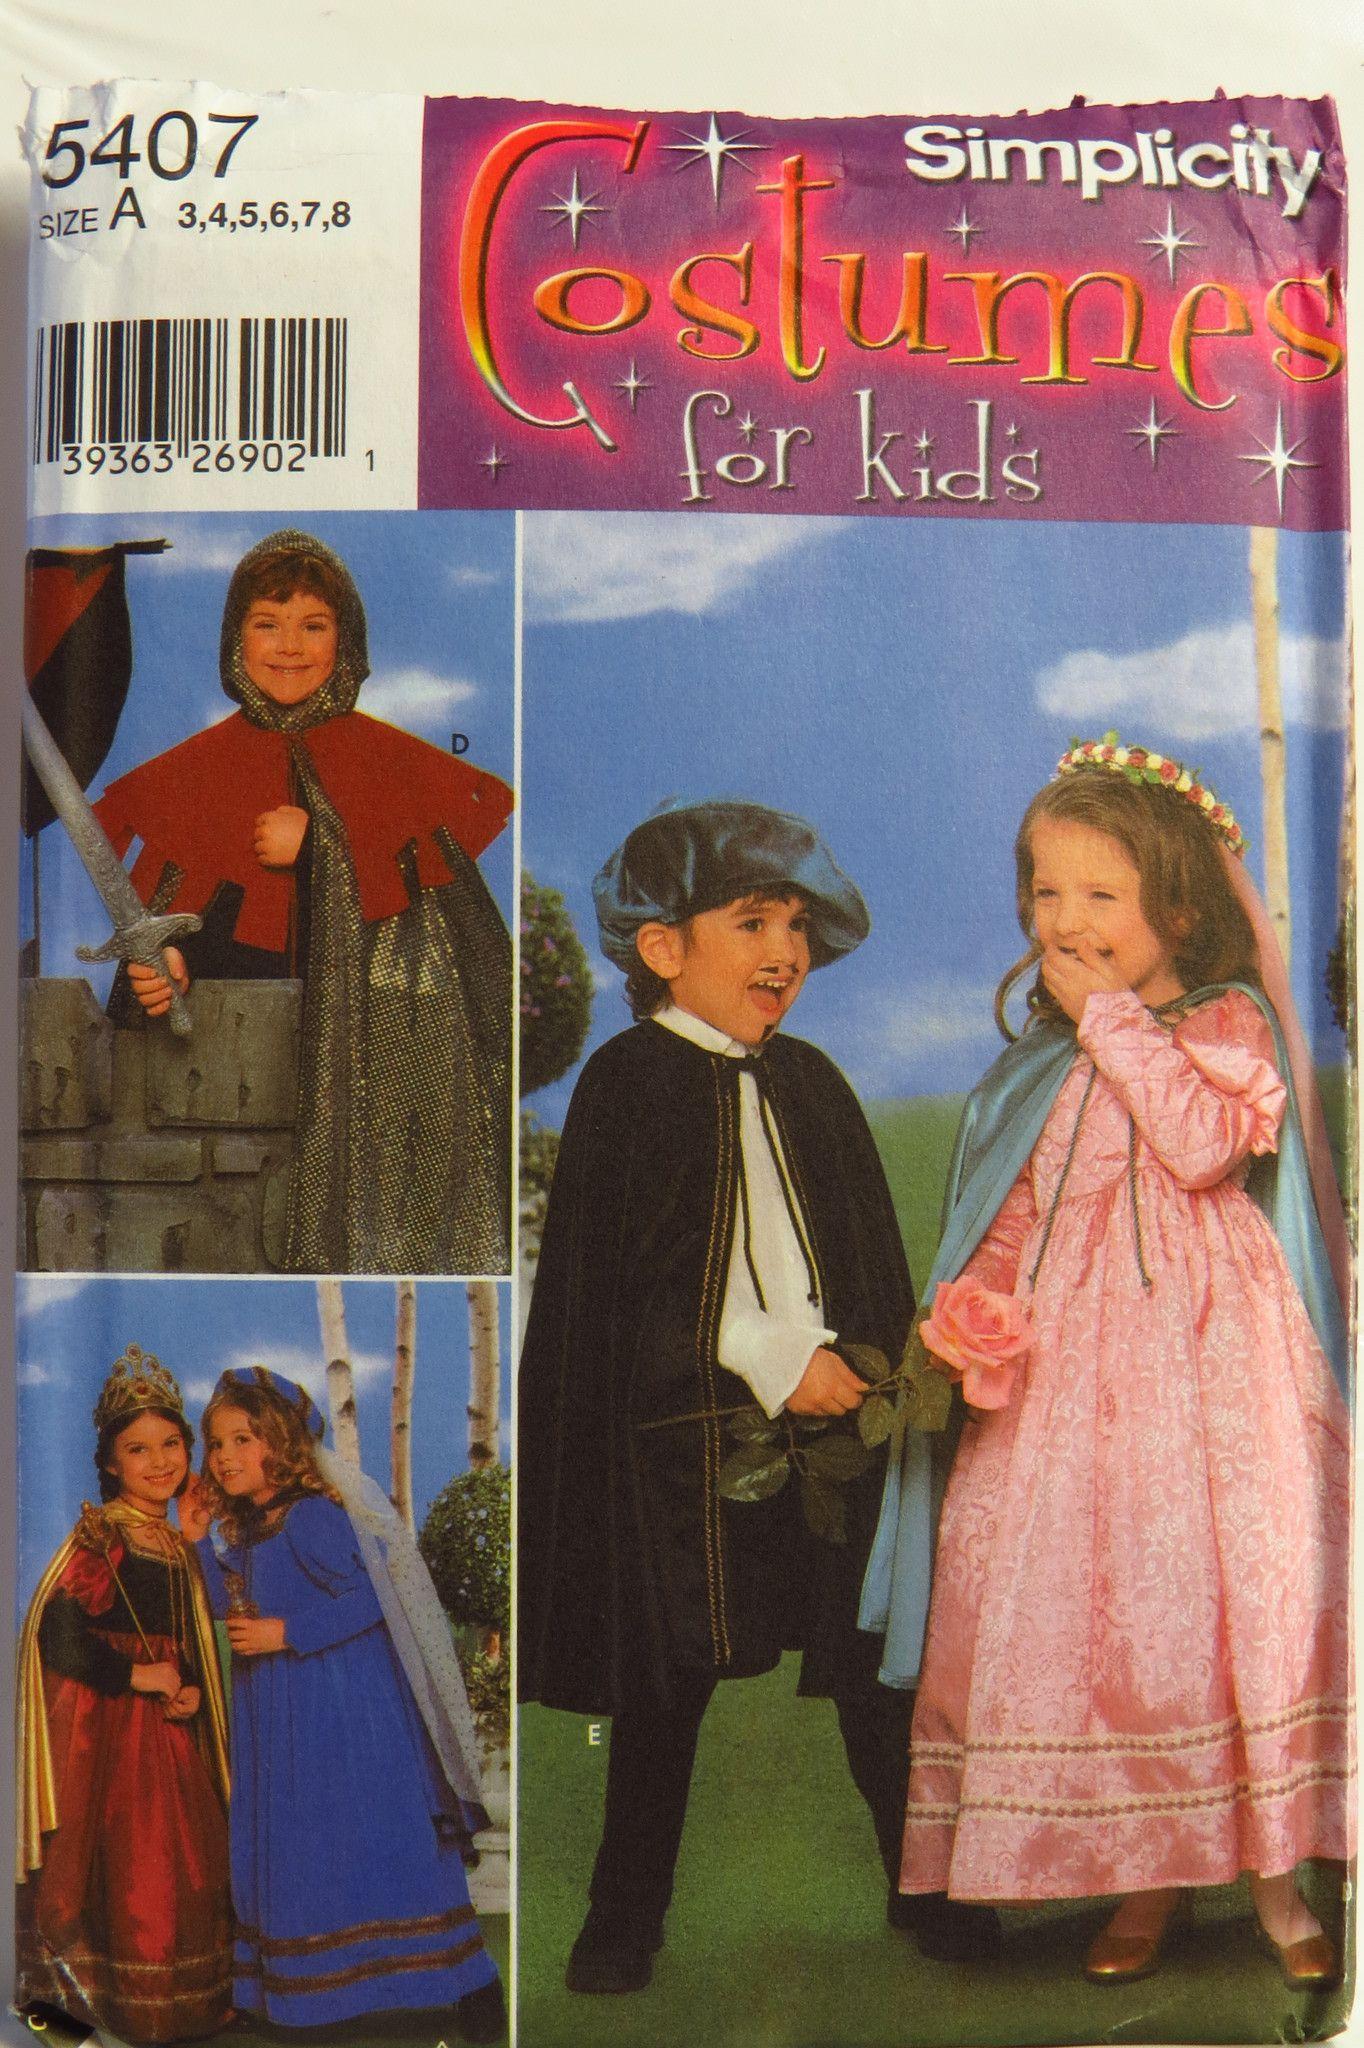 Simplicity 5407 Child's Costumes